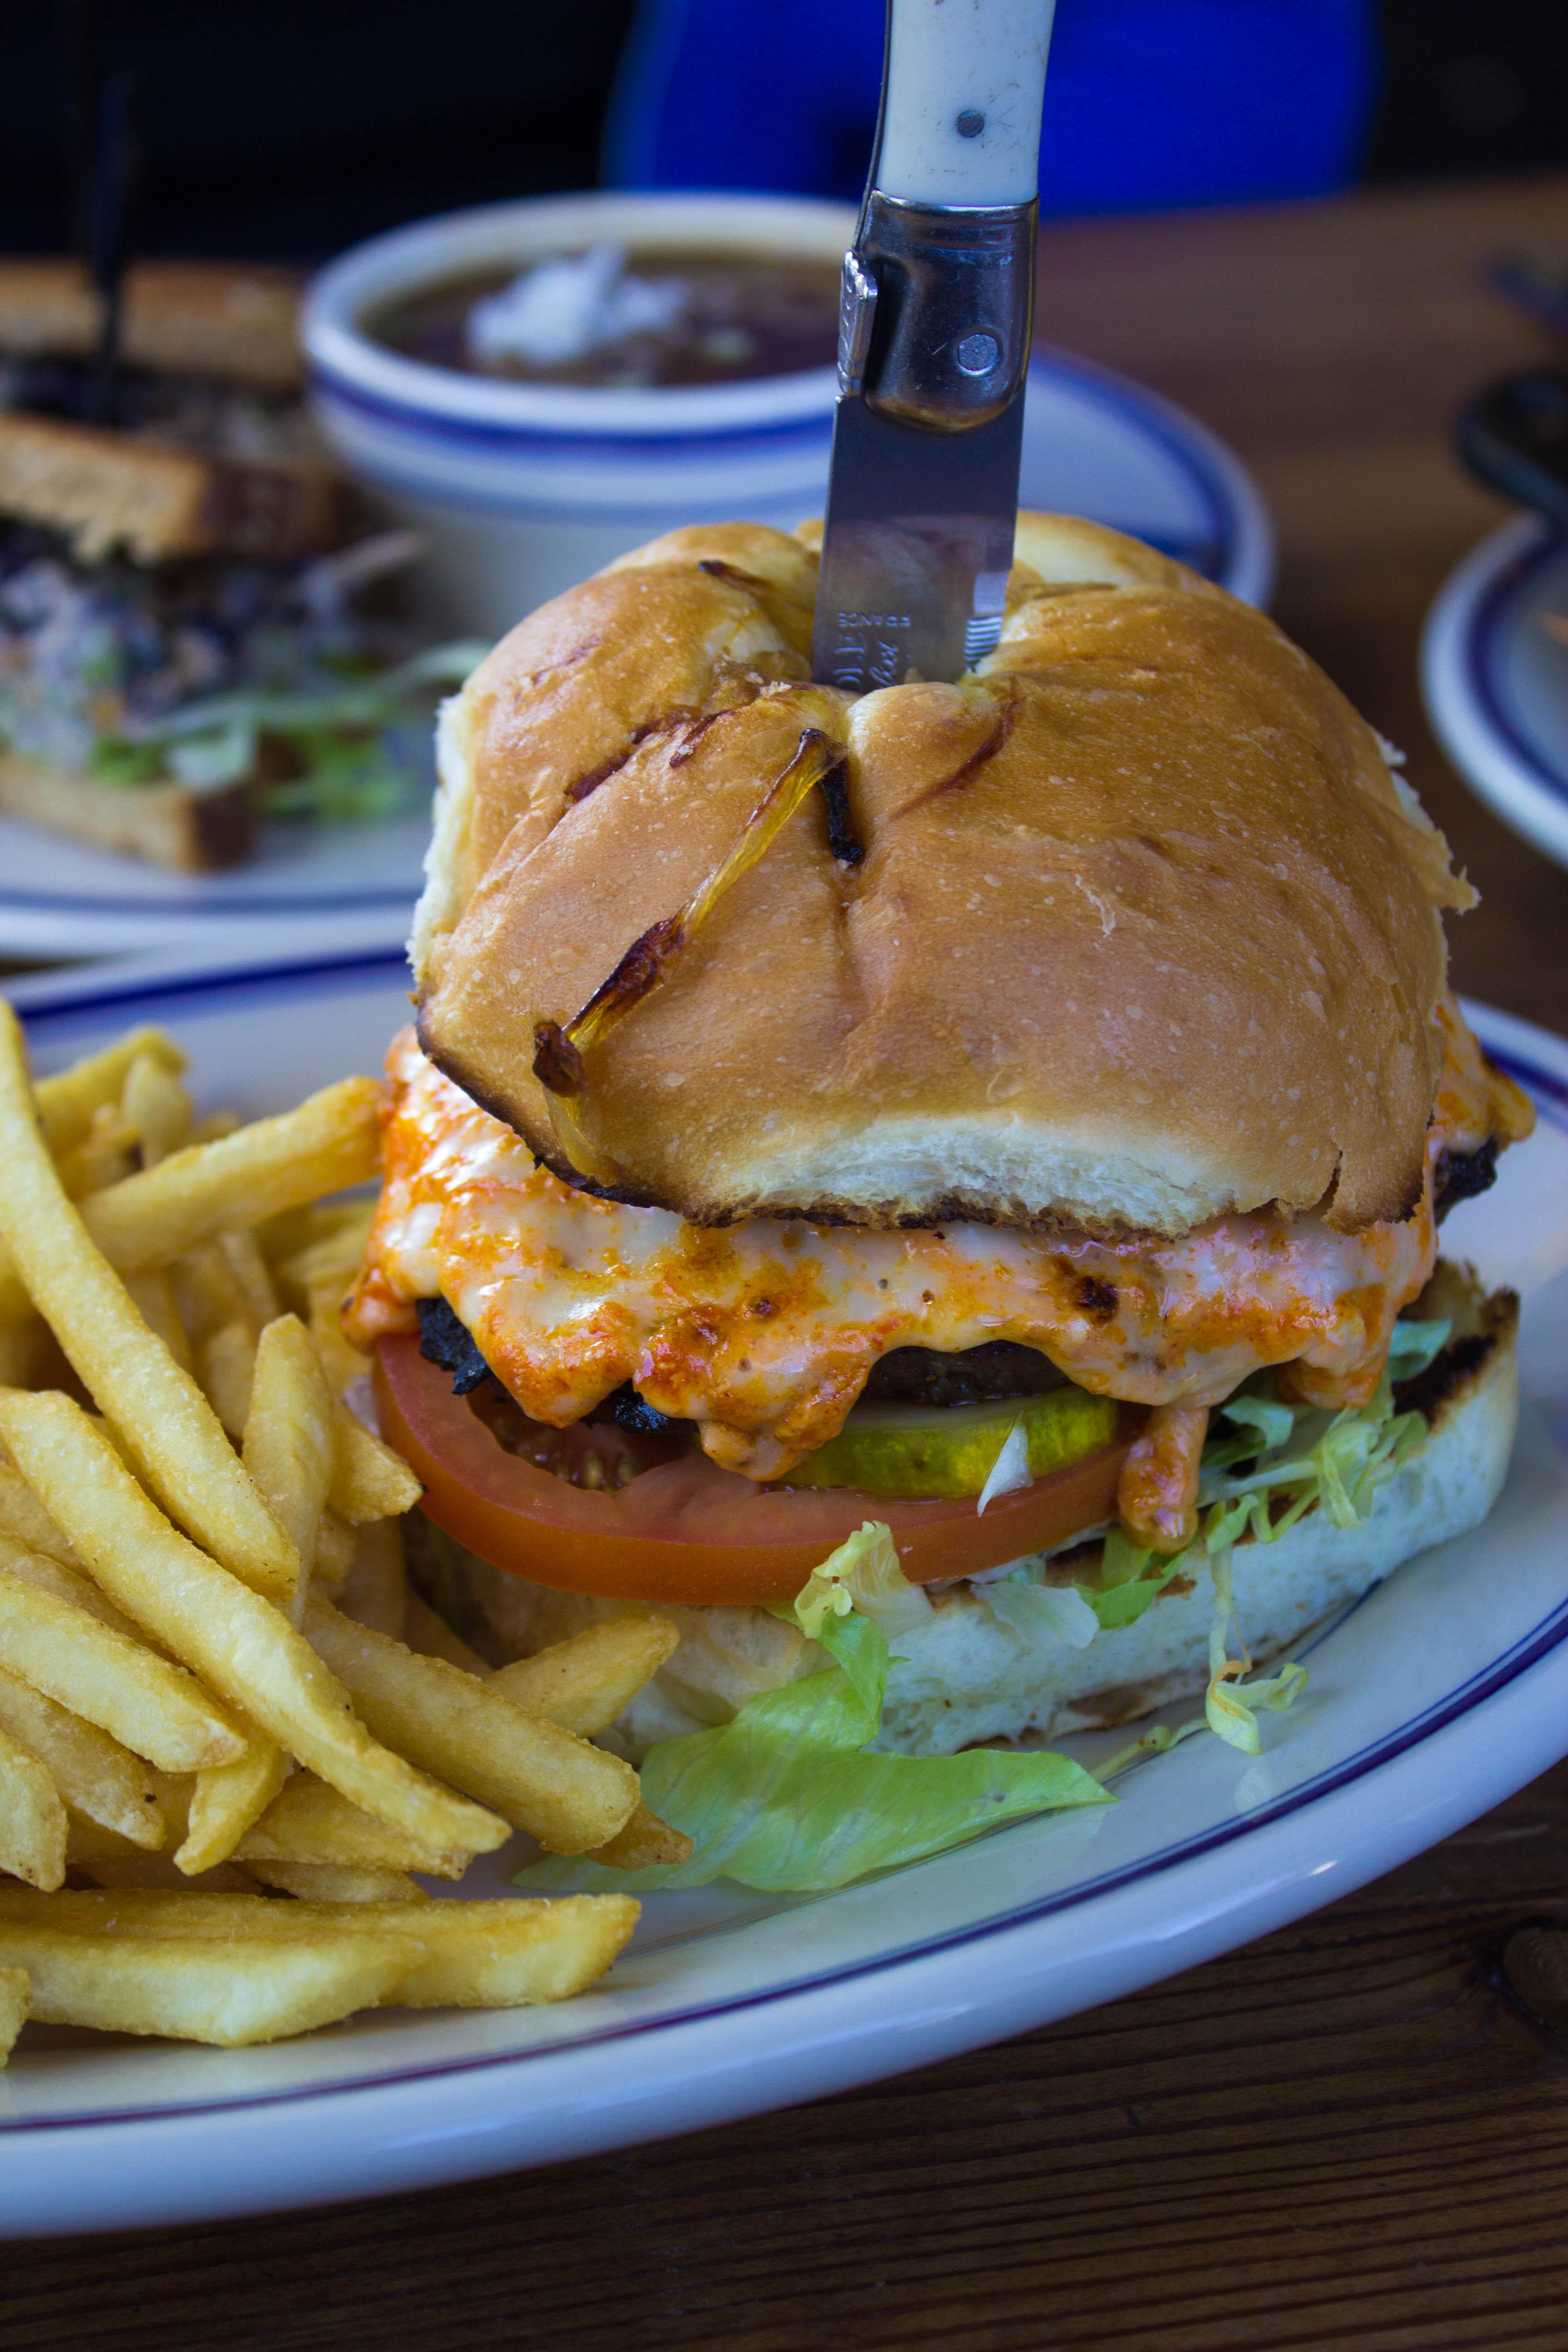 Spokaneeats Guide To Inlander Restaurant Week 2017